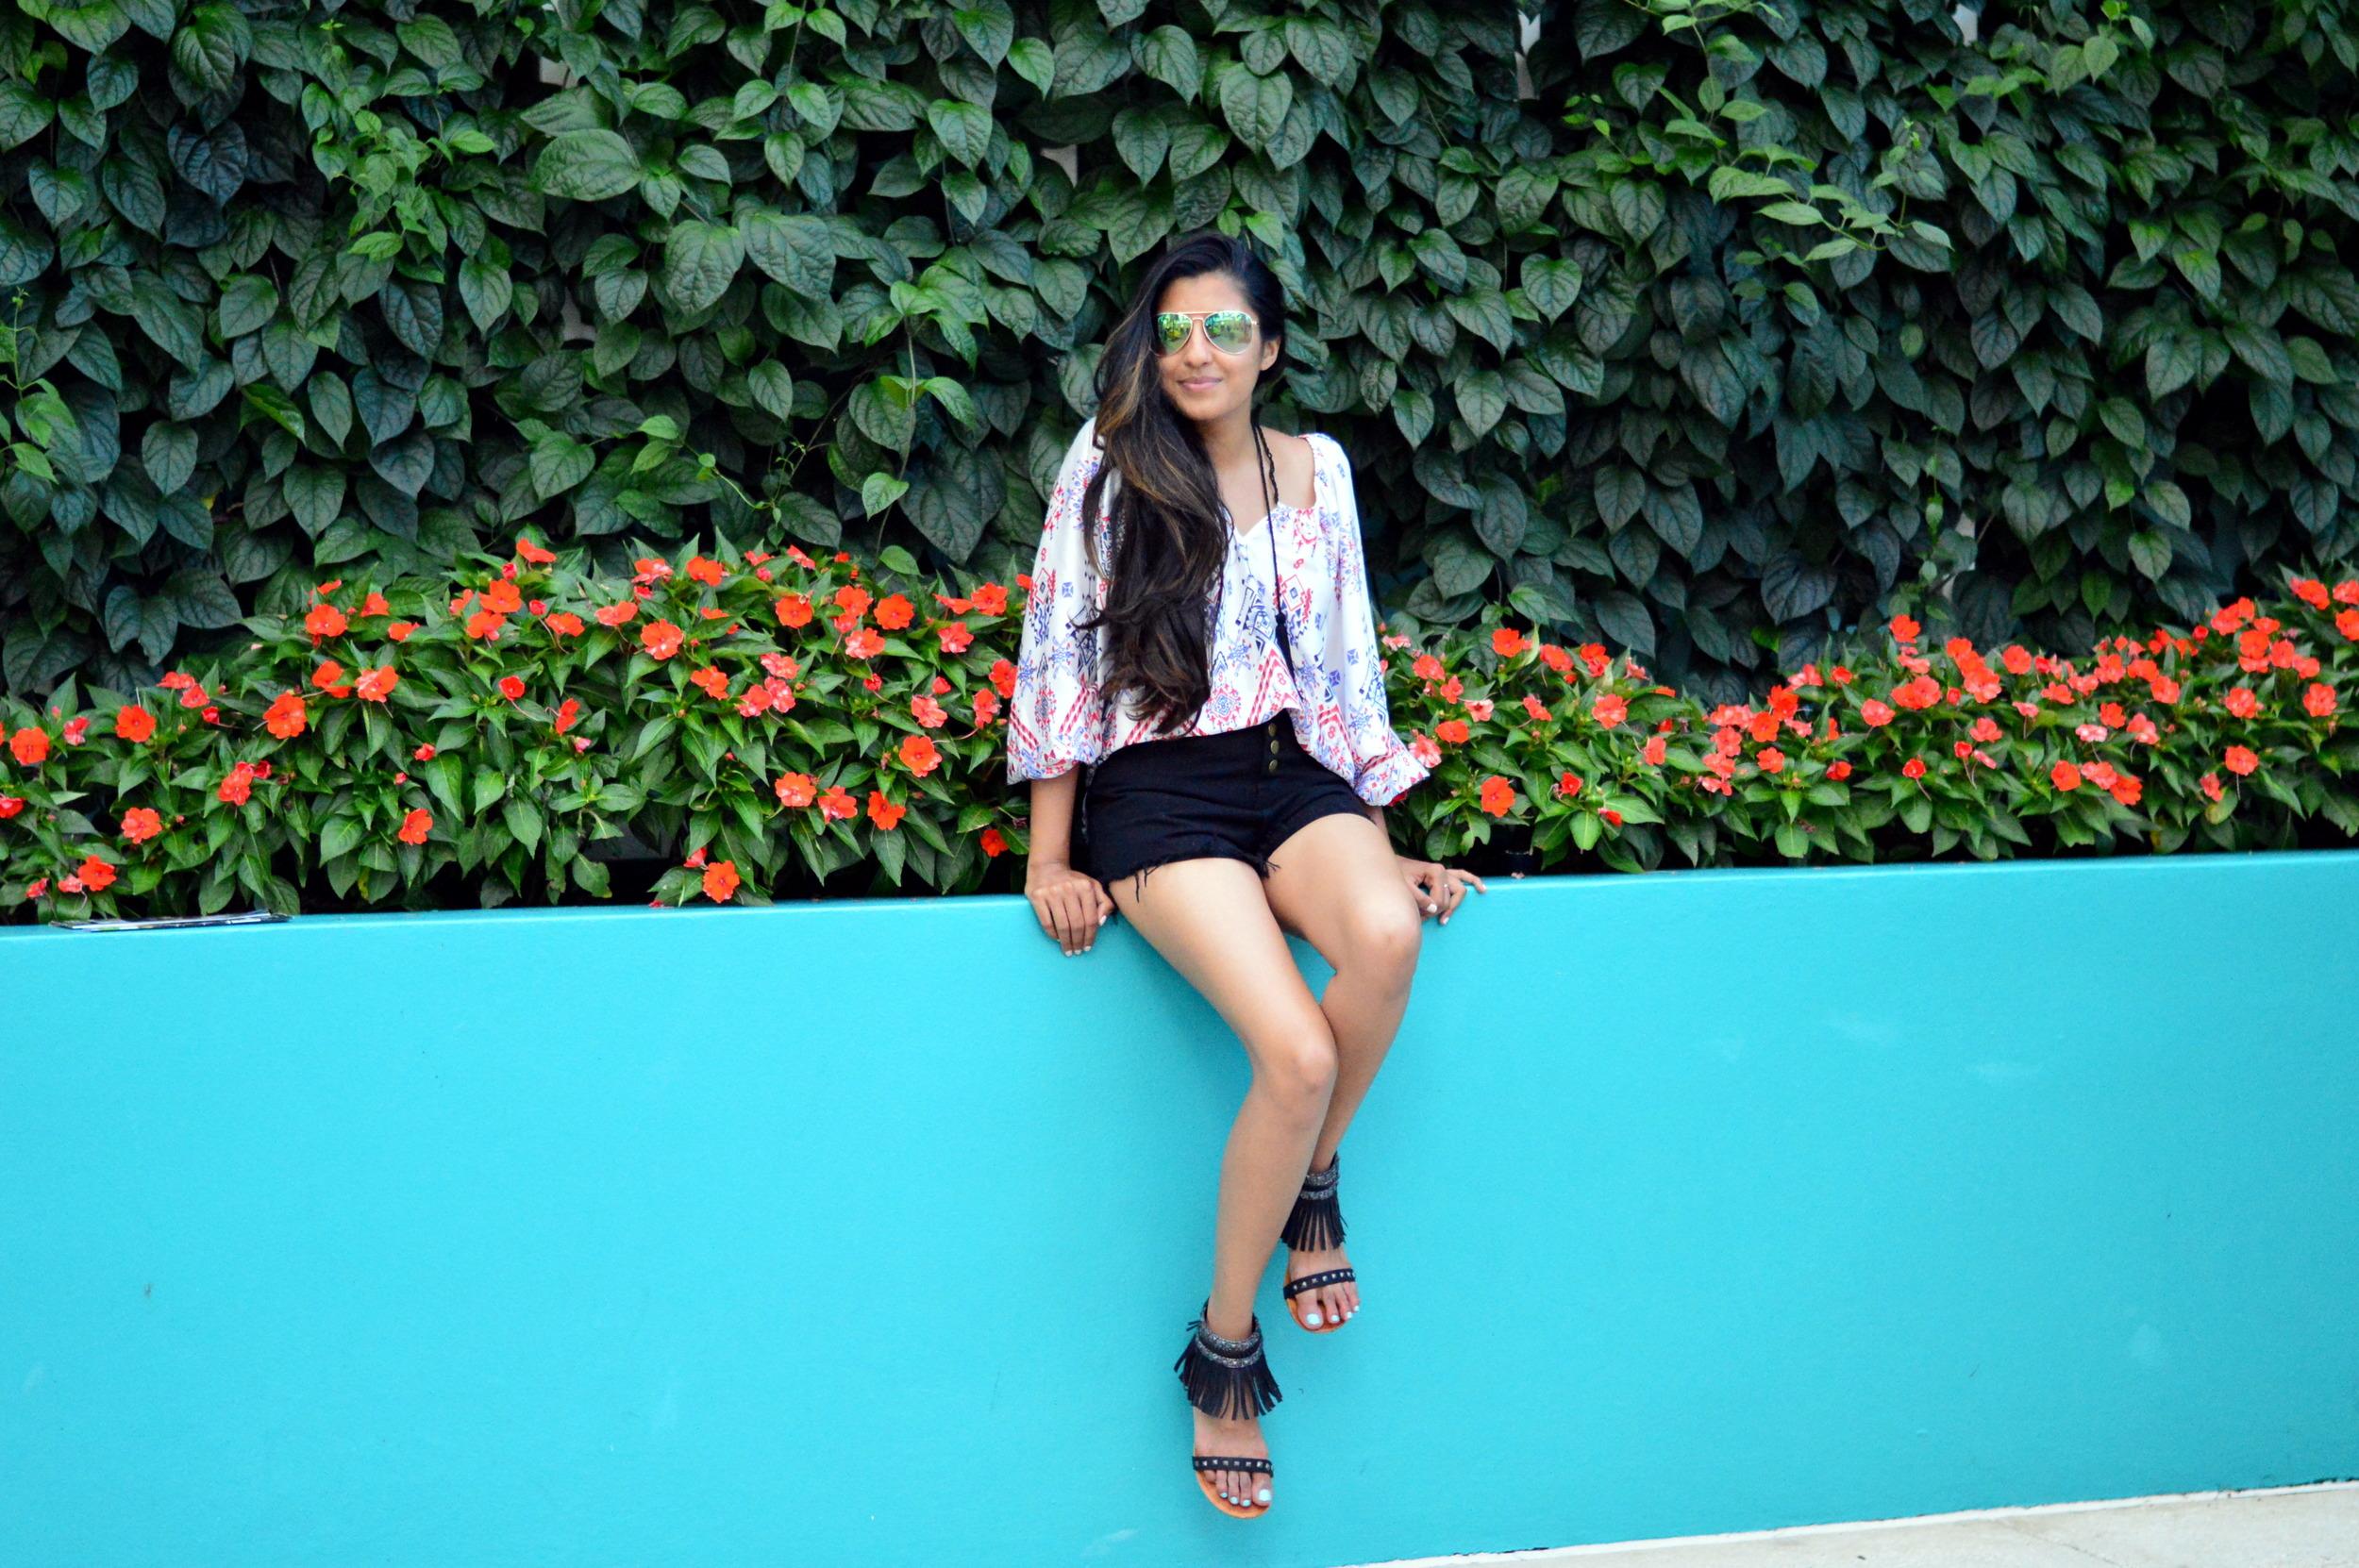 denim-highwaisted-cutoff-shorts-printed-tasseled-peasant-blouse-summer-outfit 1